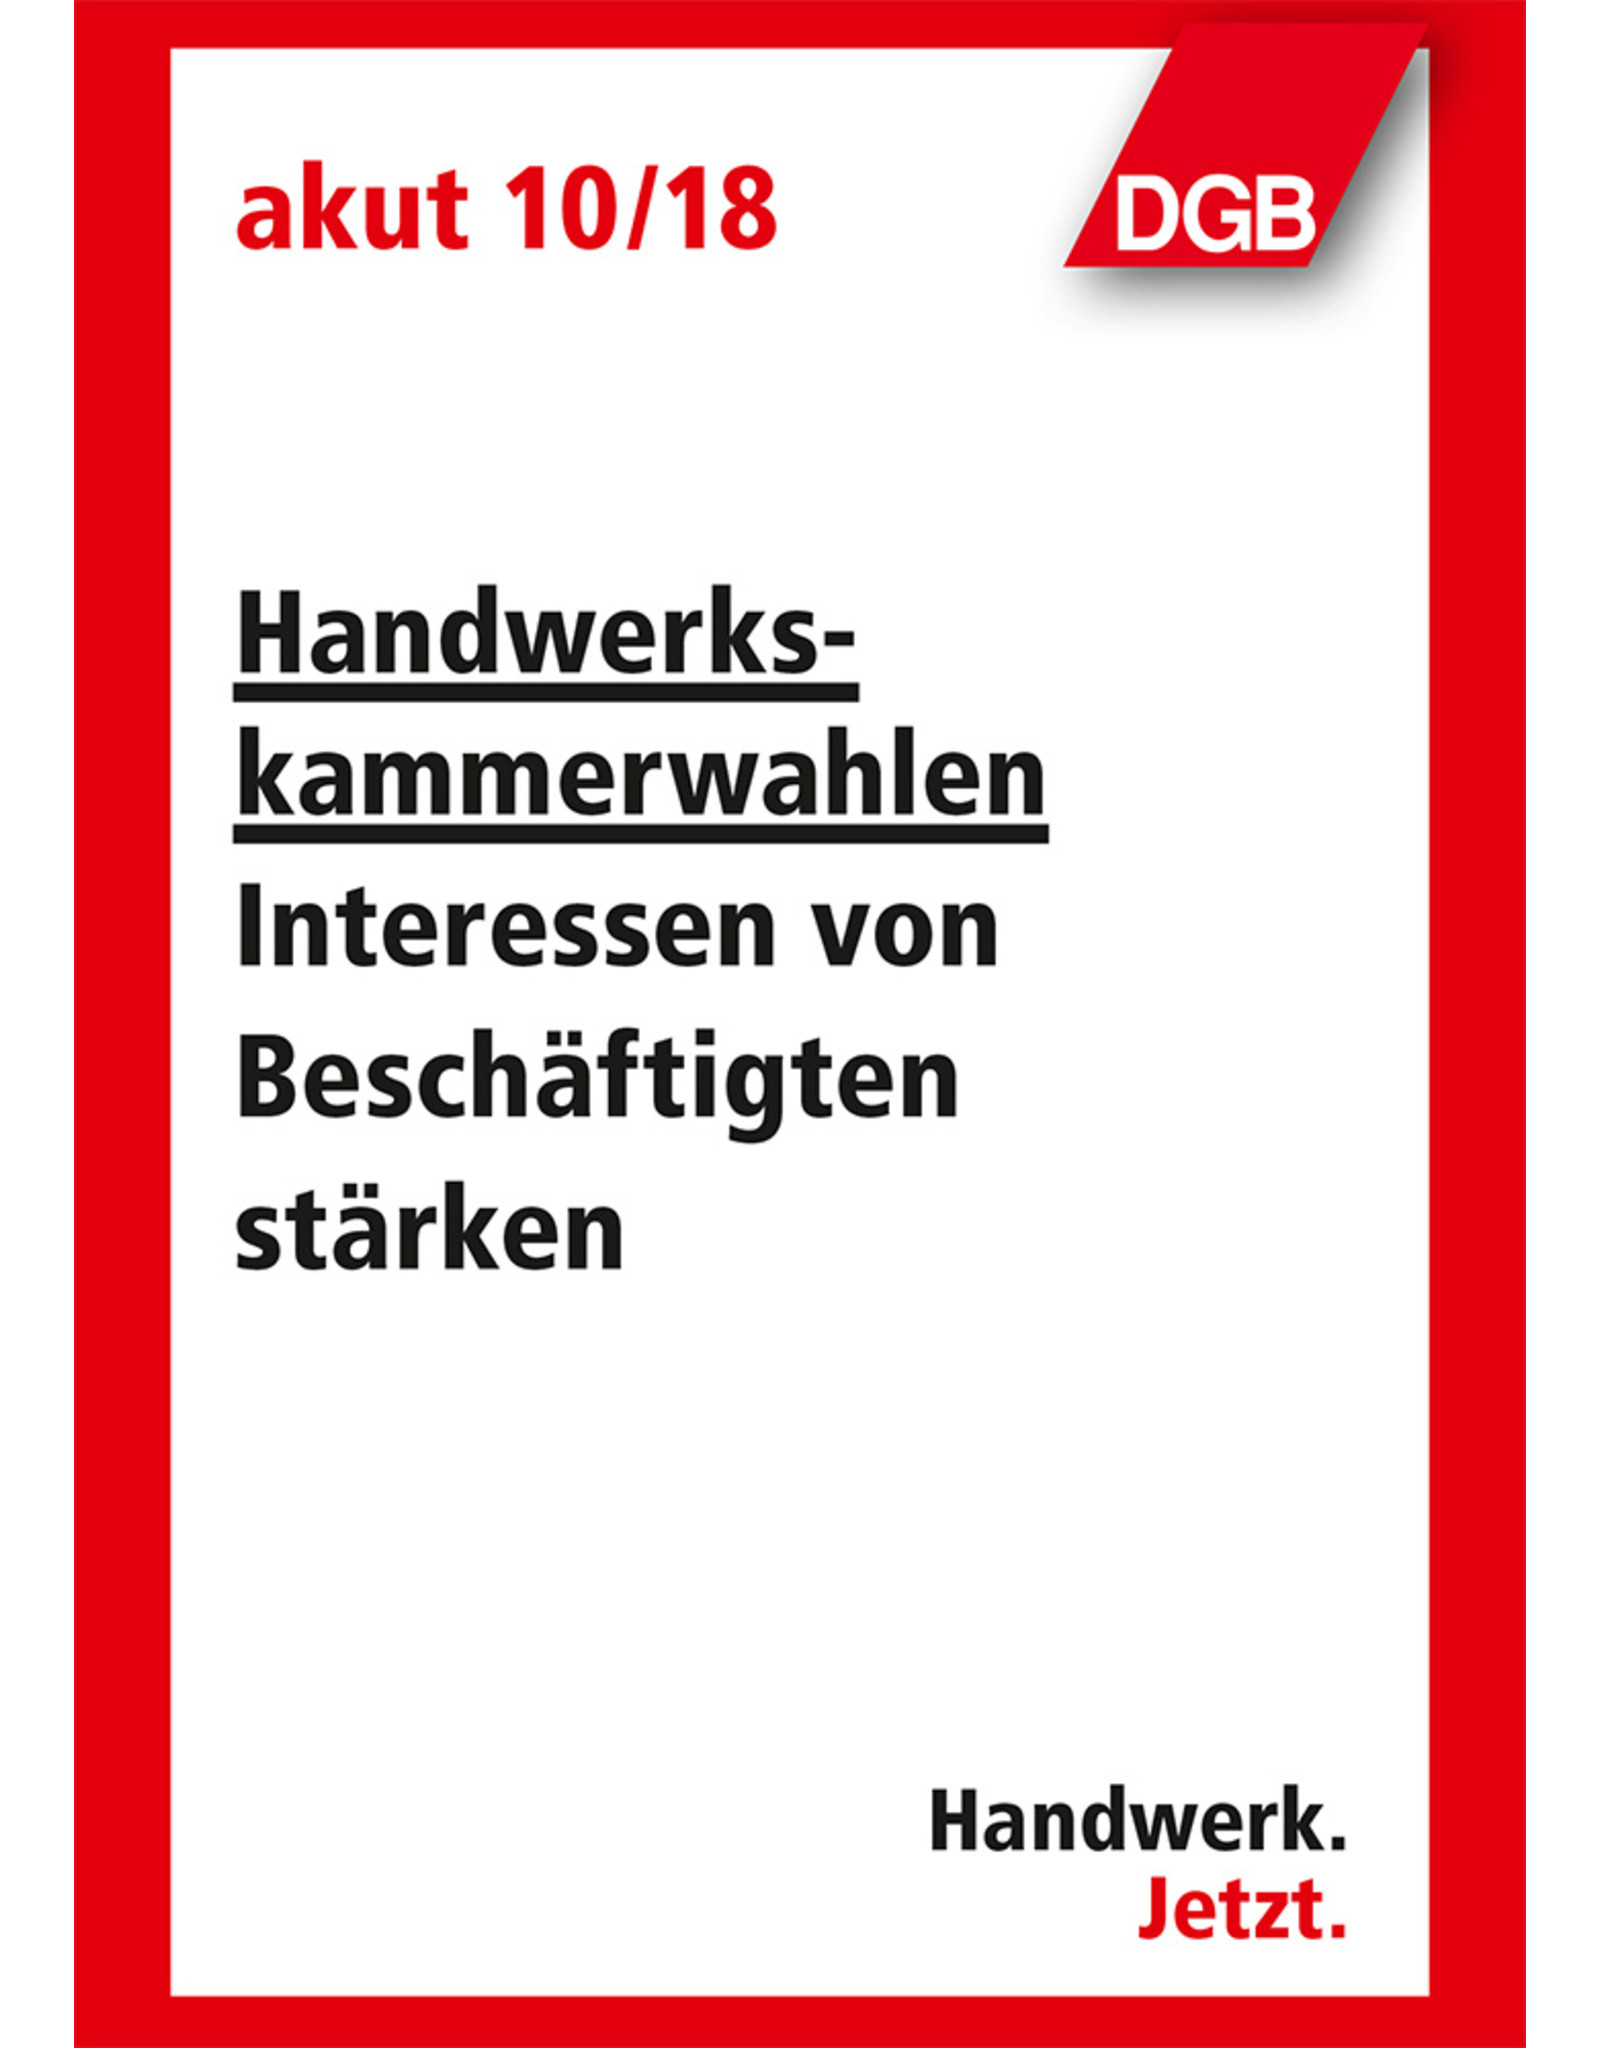 Broschüre akut 10/2018 (zu 320 Stk. im Karton)